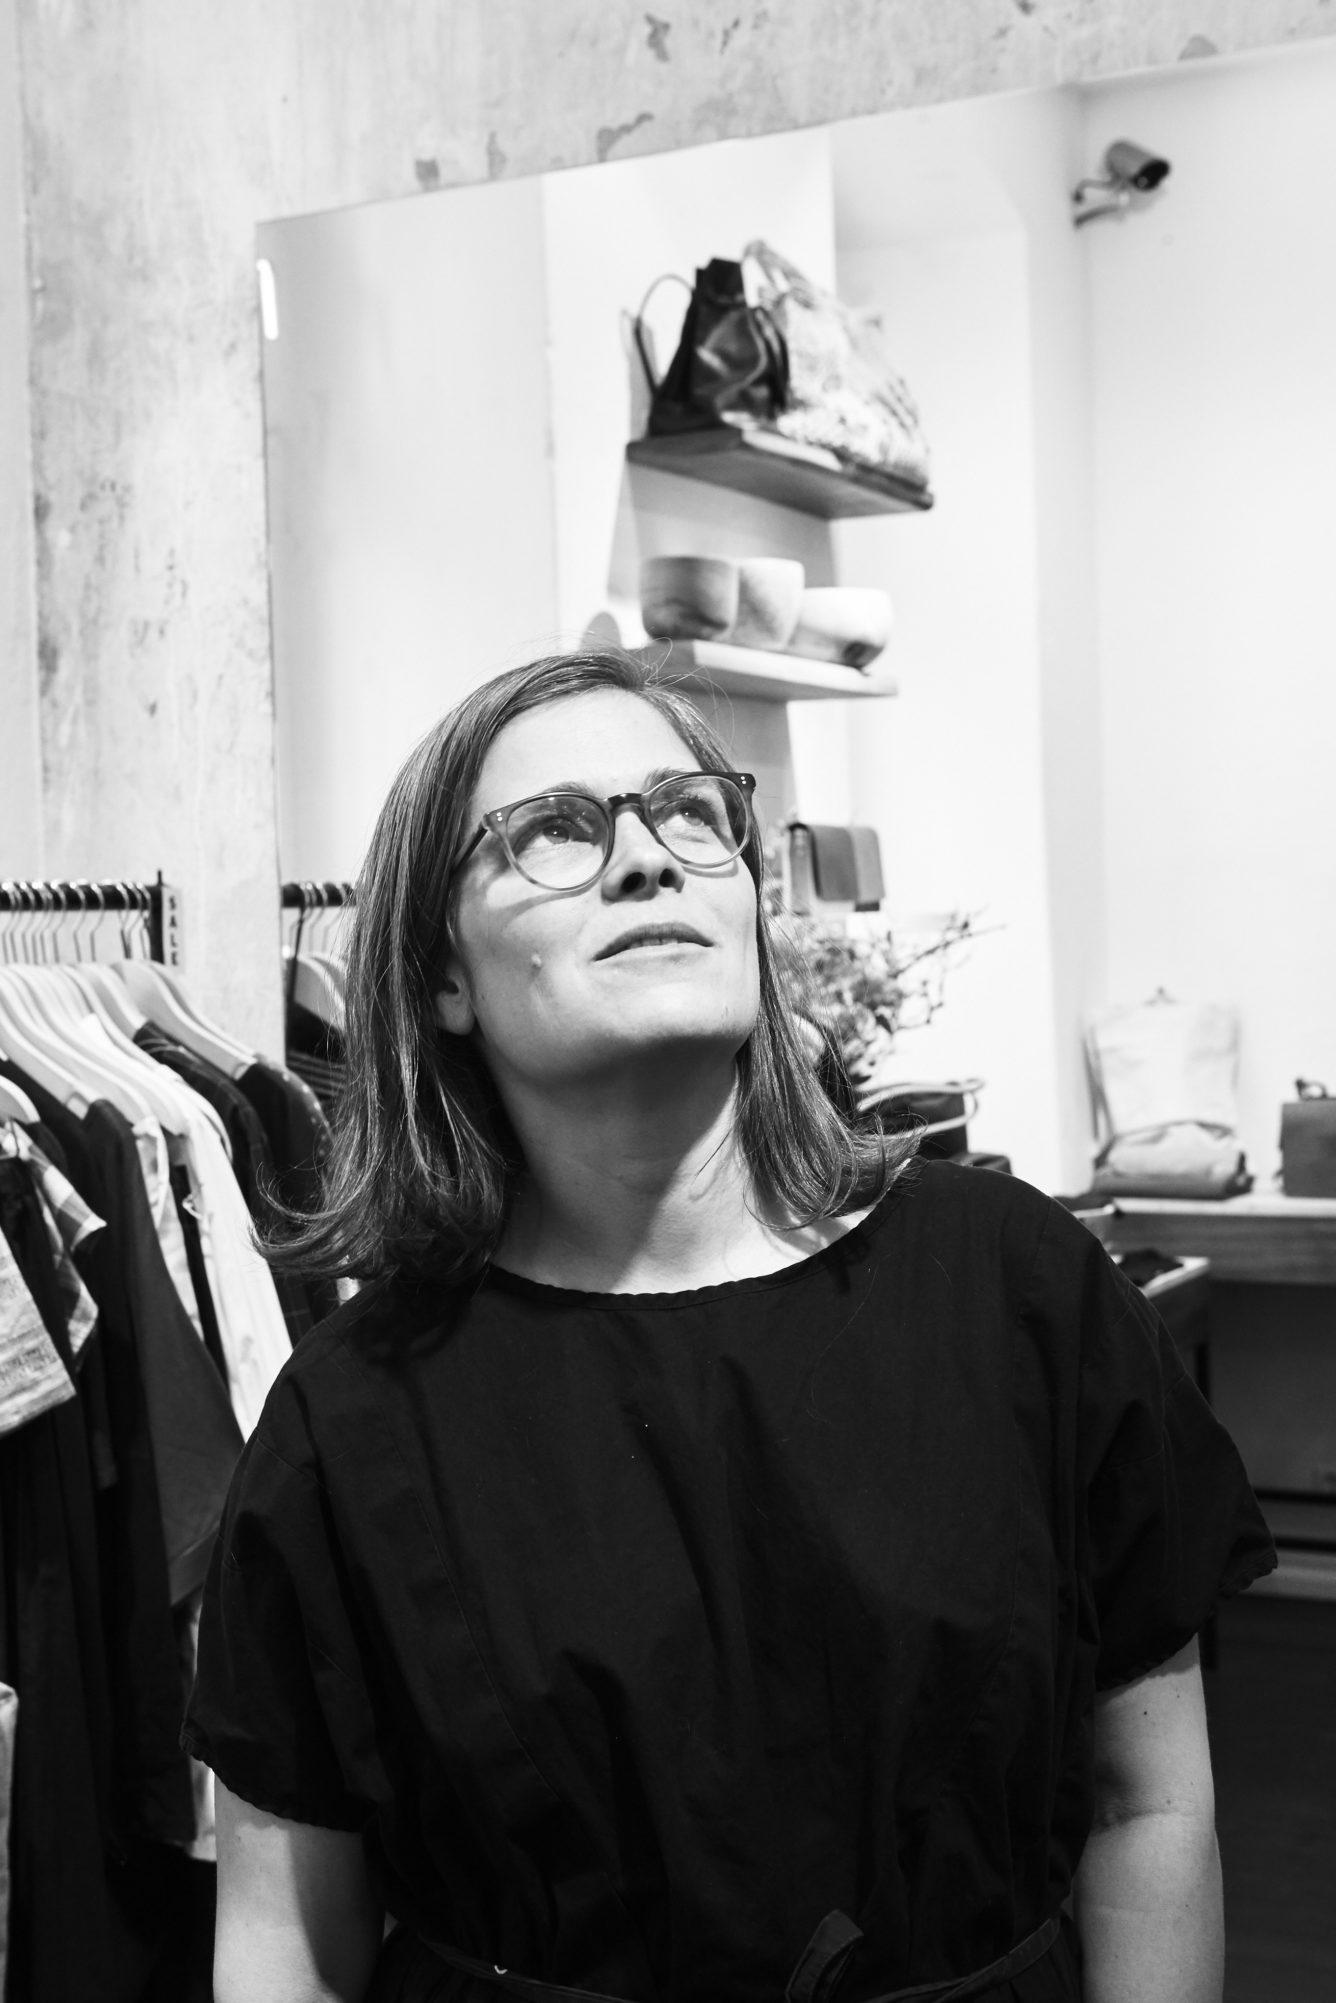 Sonja Lotz im Interview   MOEON auf GROSS∆RTIG   Foto: Magdalena Vidovic